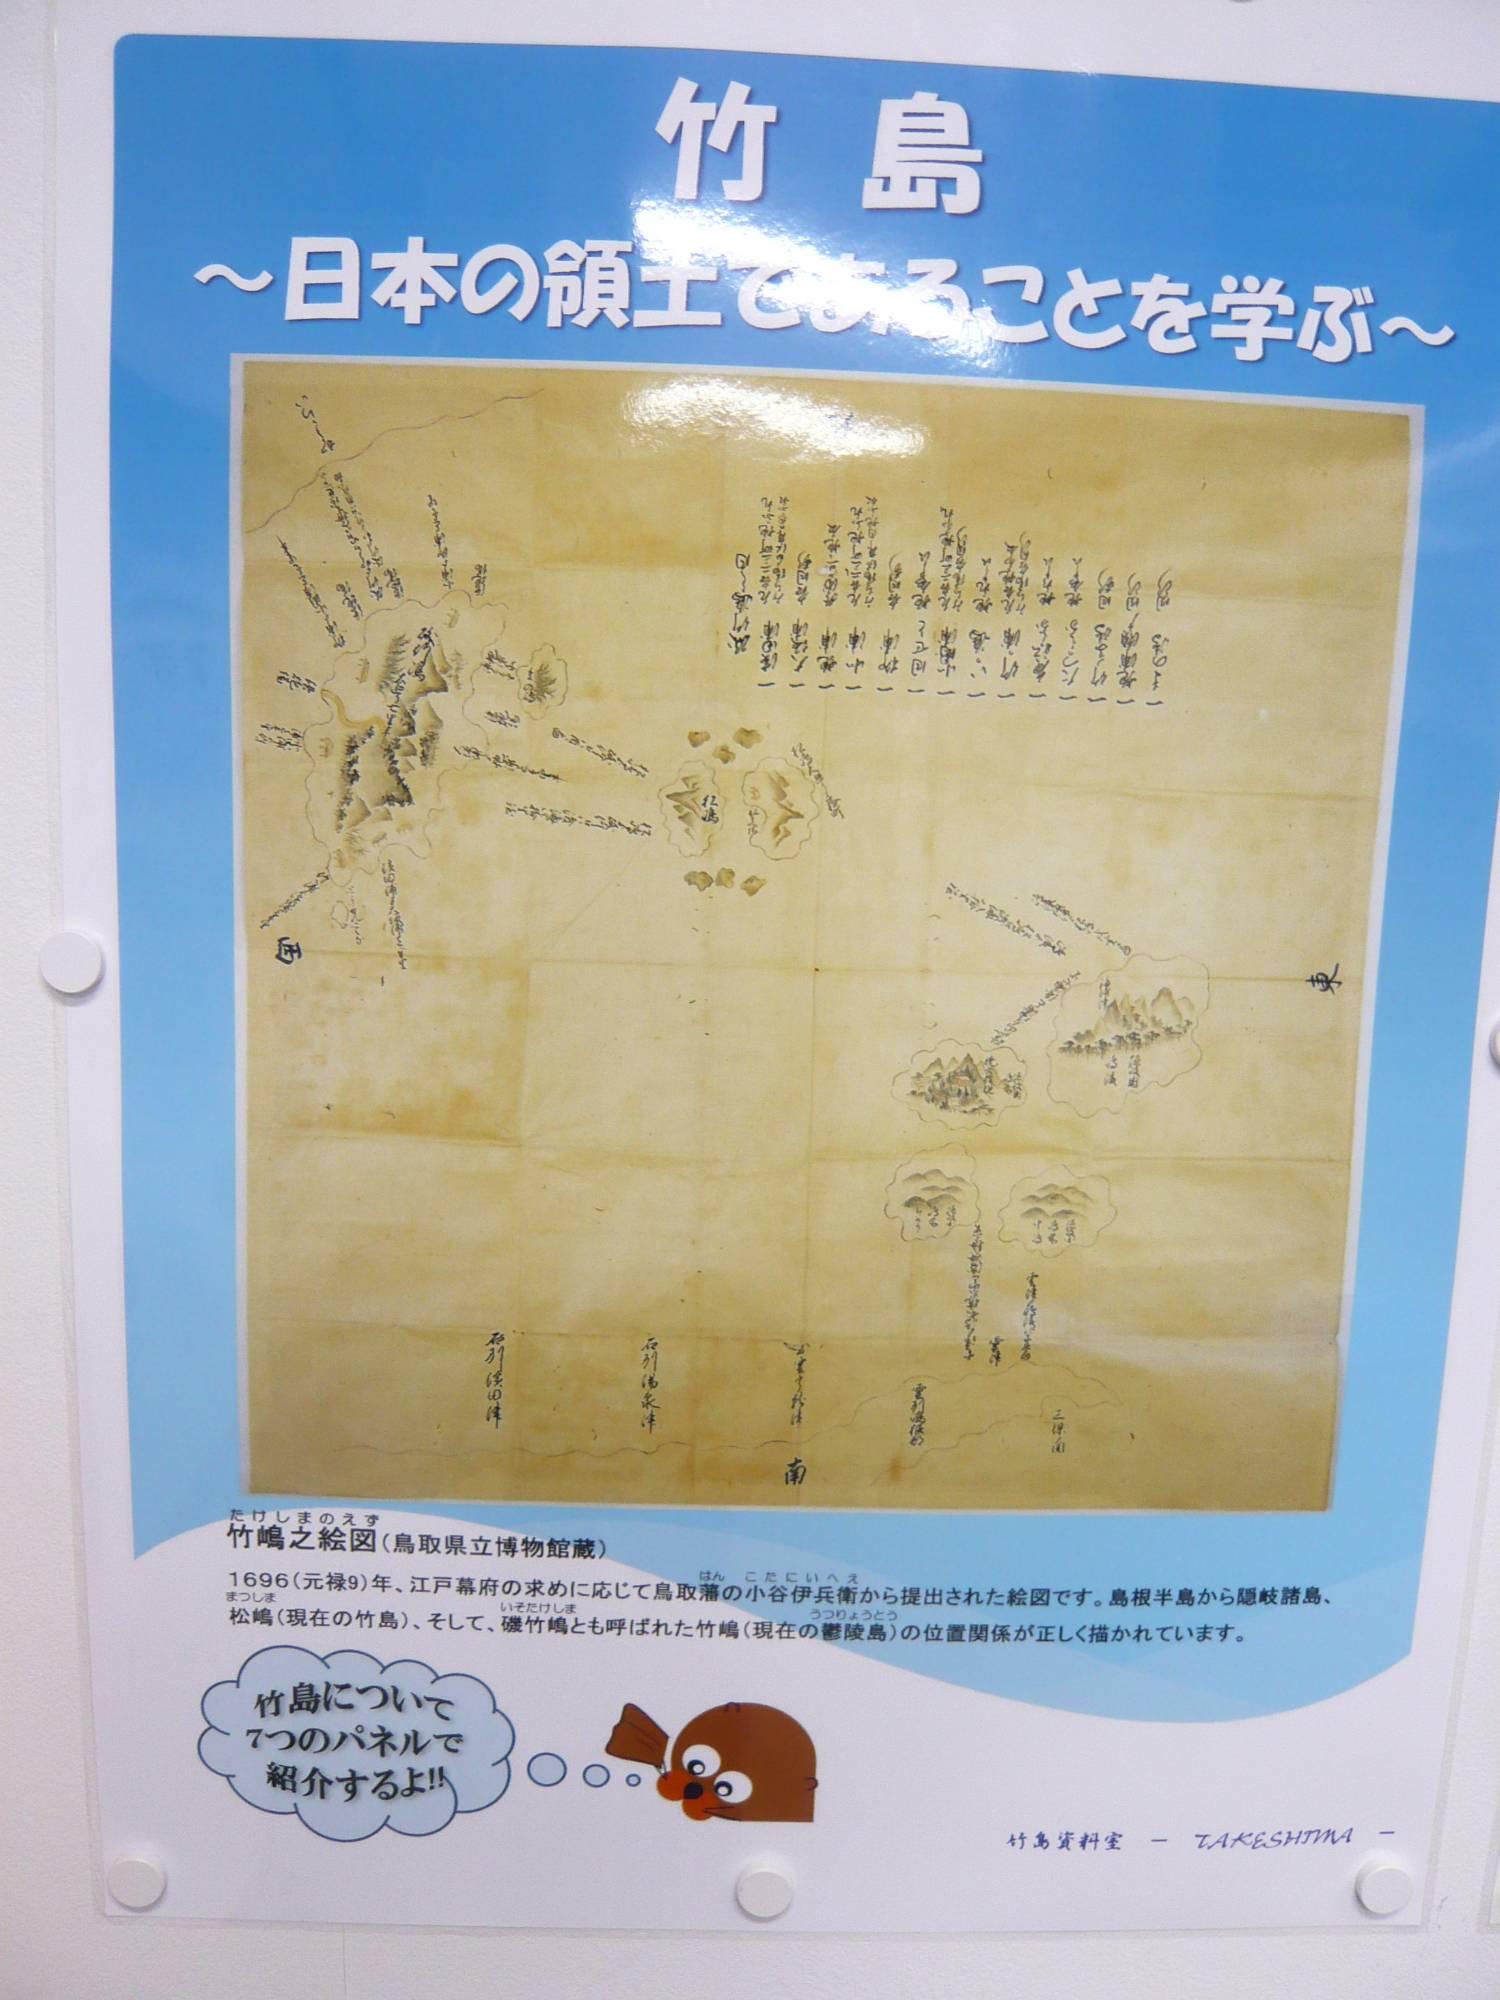 Go!Go!キョロちゃん Go!Go!Kyoro Chan 竹島資料室 (島根県庁内) 松江市 ...